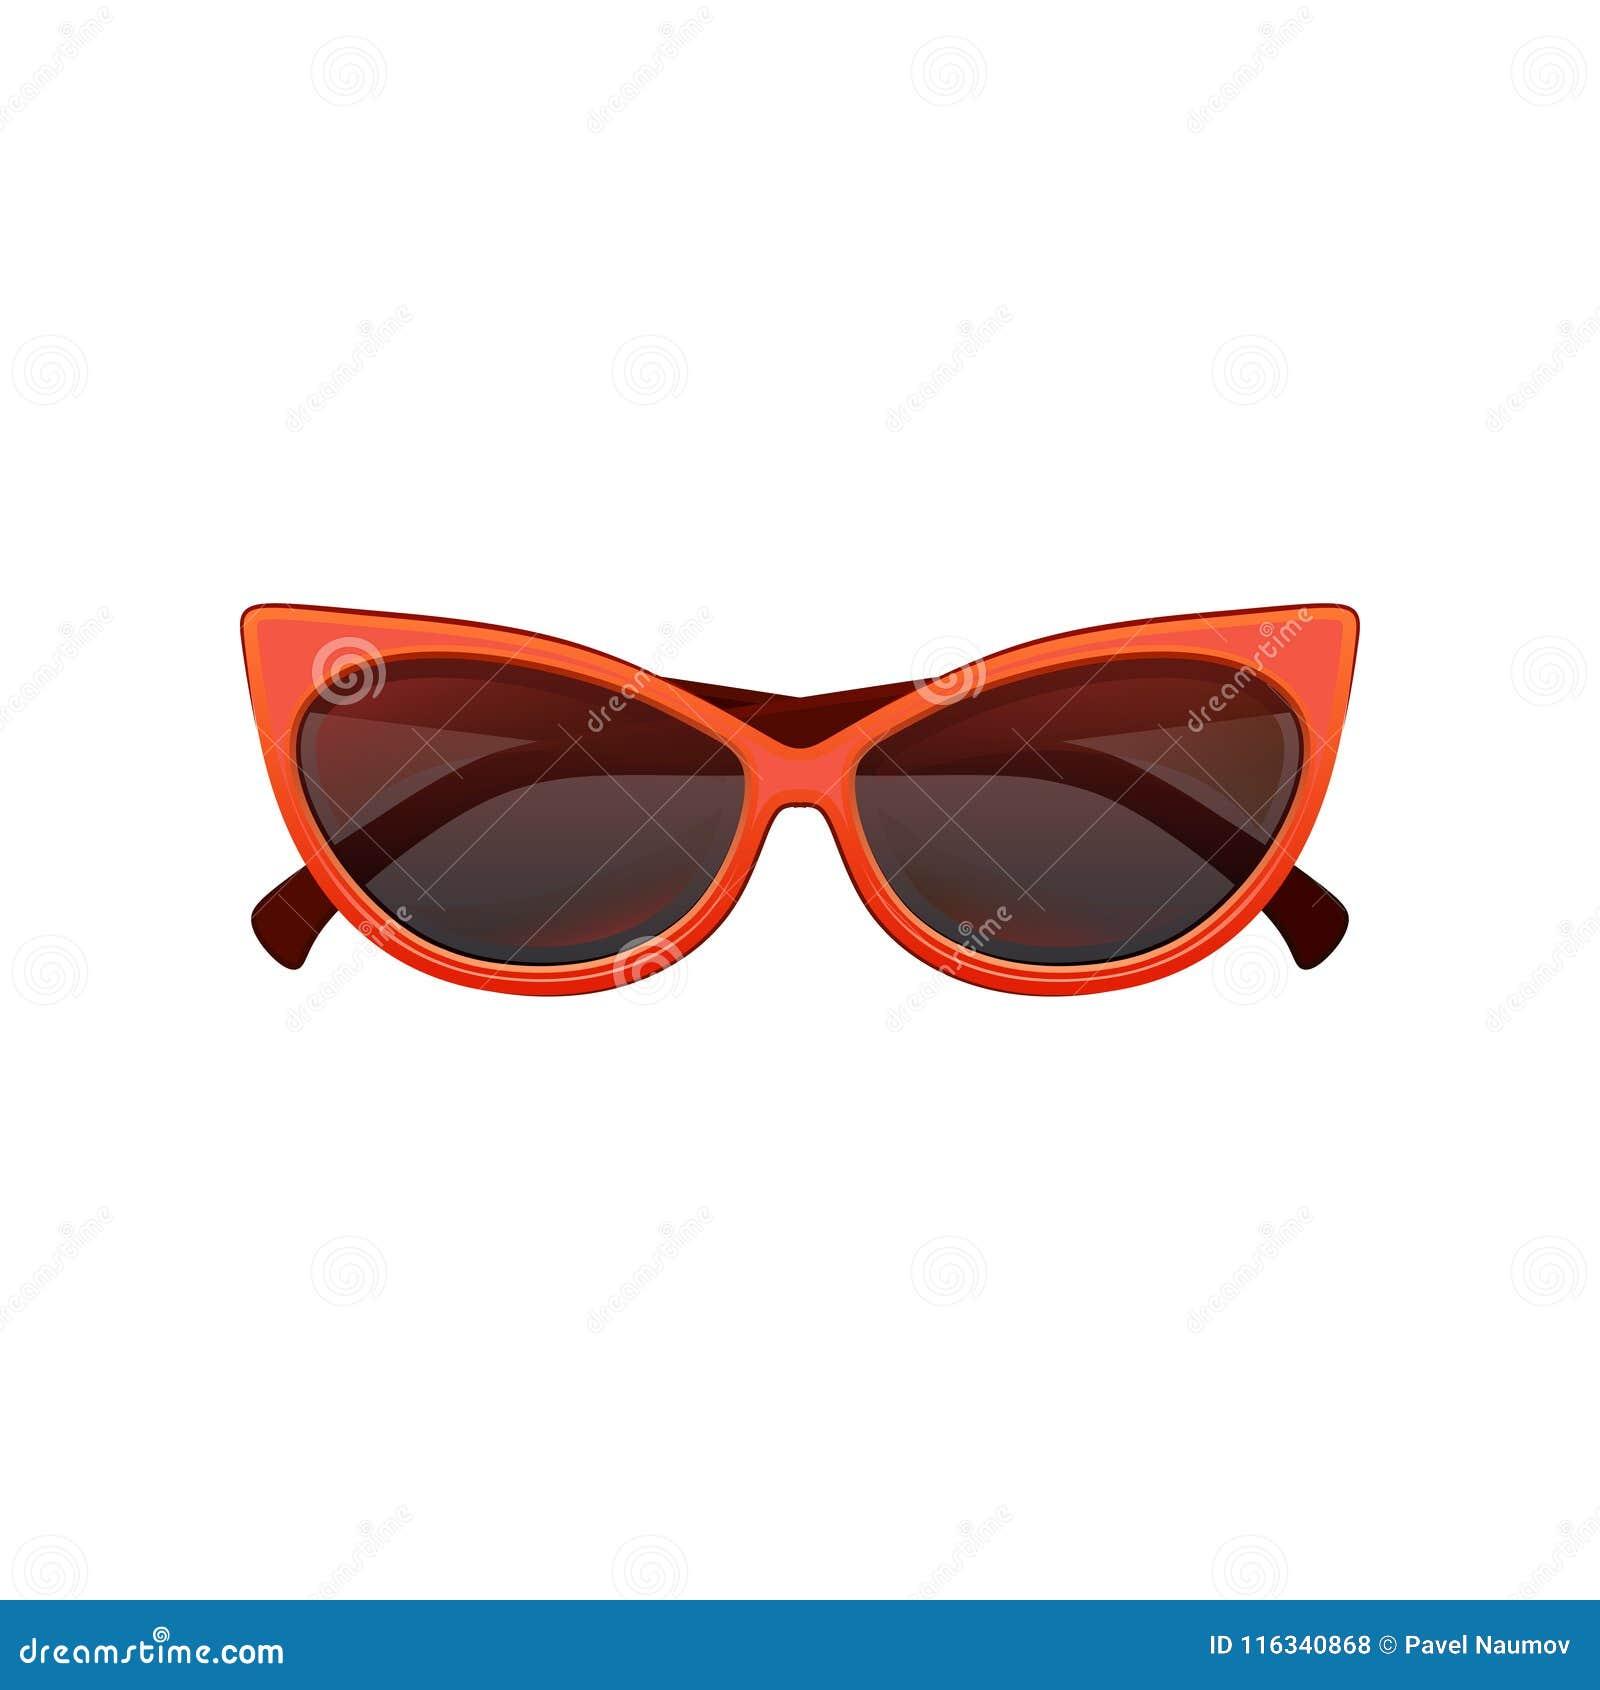 eedabde444 Γυαλιά ηλίου ματιών γατών γοητείας με τους μαύρους βαμμένους φακούς και το  φωτεινό κόκκινο πλαστικό πλαίσιο